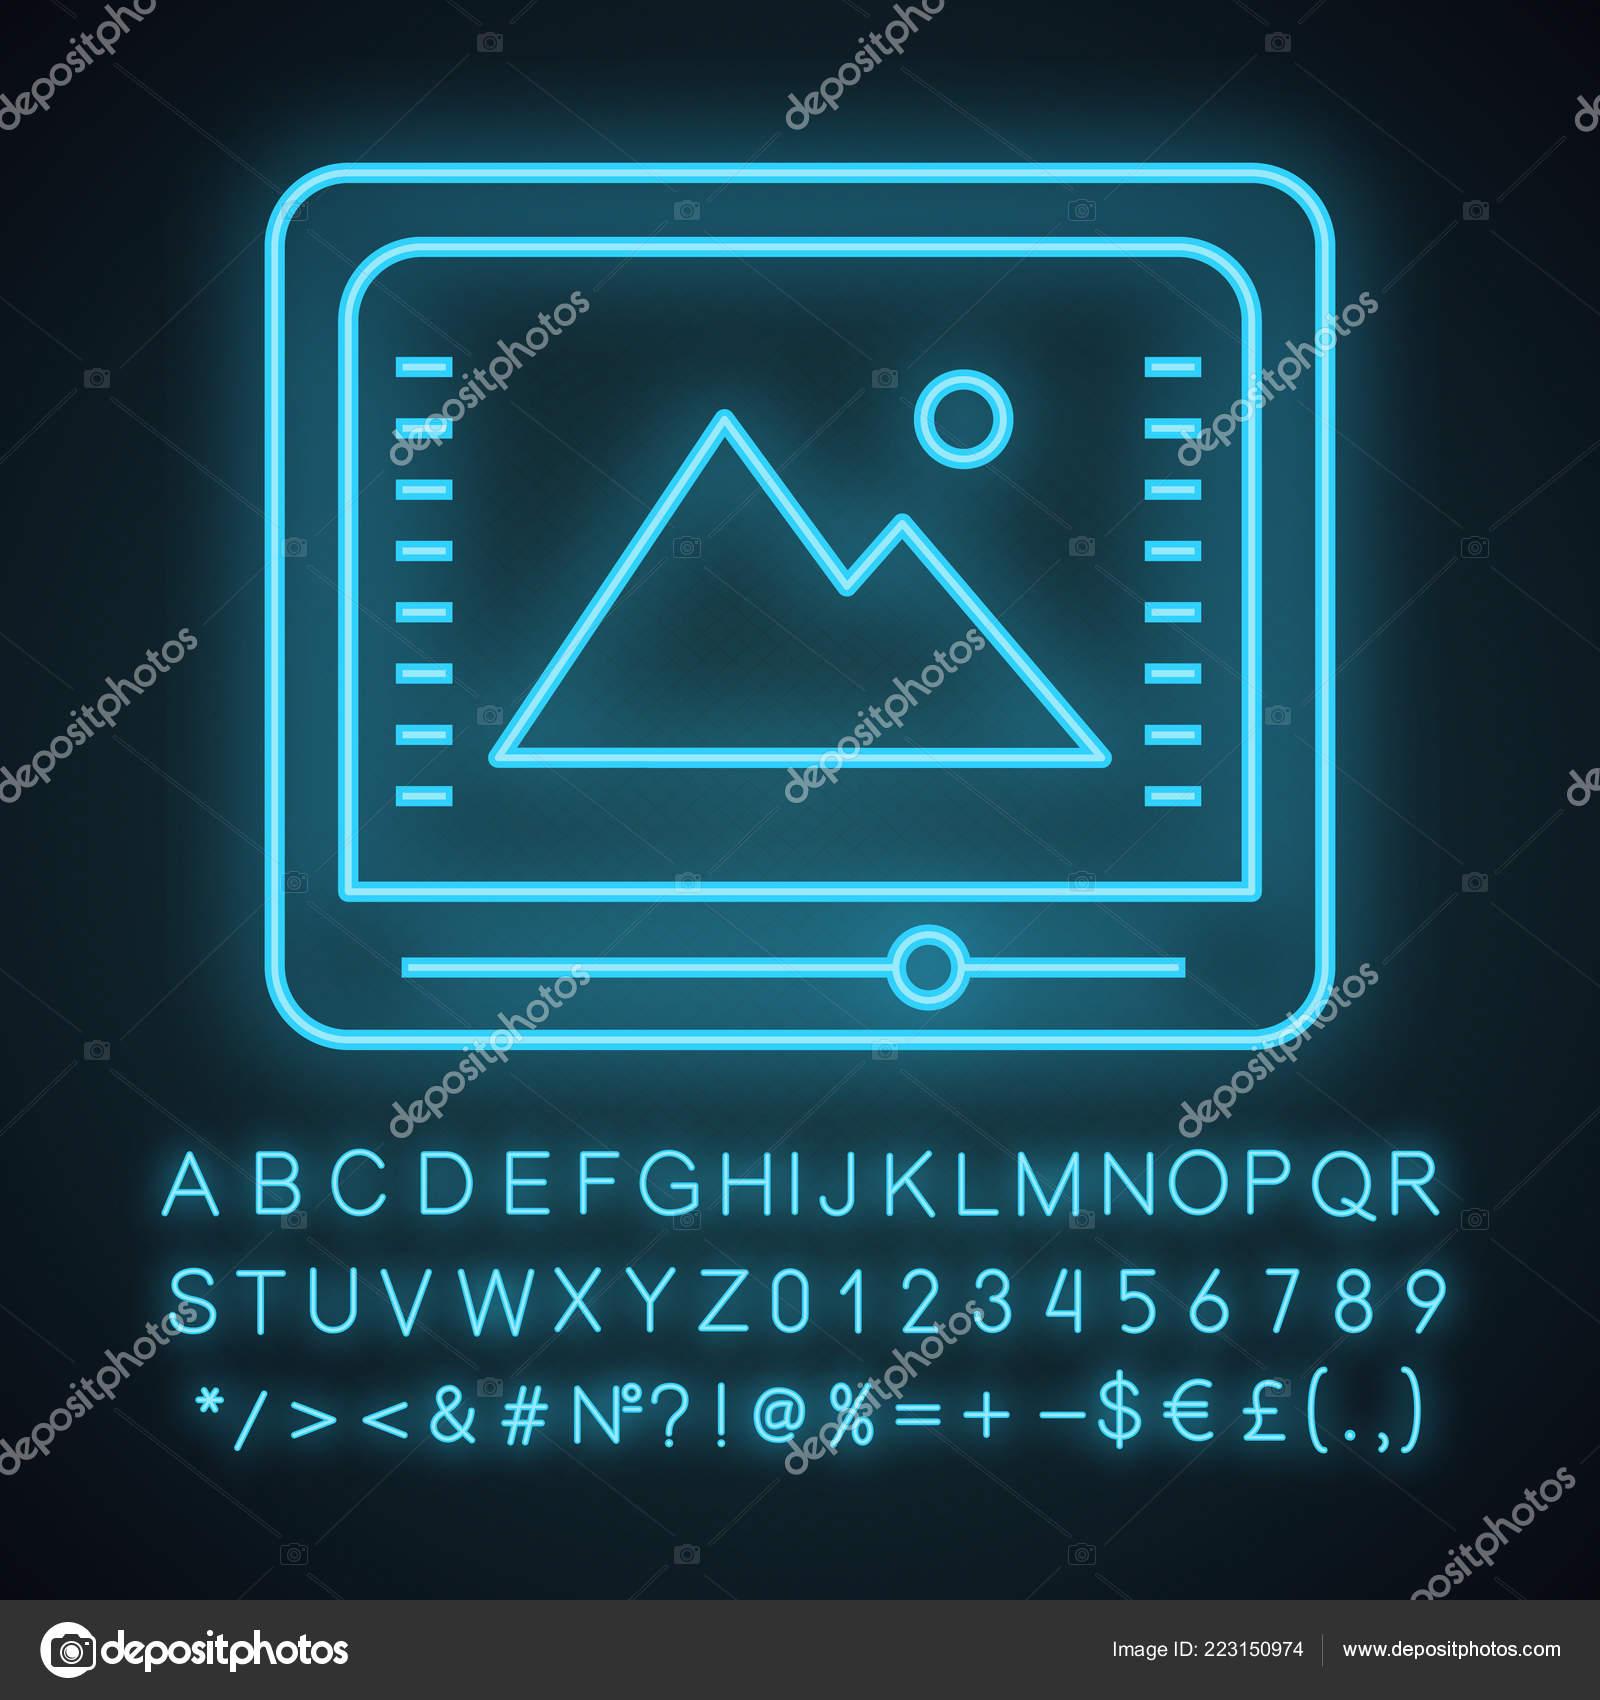 Color Correction Grading Neon Light Icon Photo Video Editing